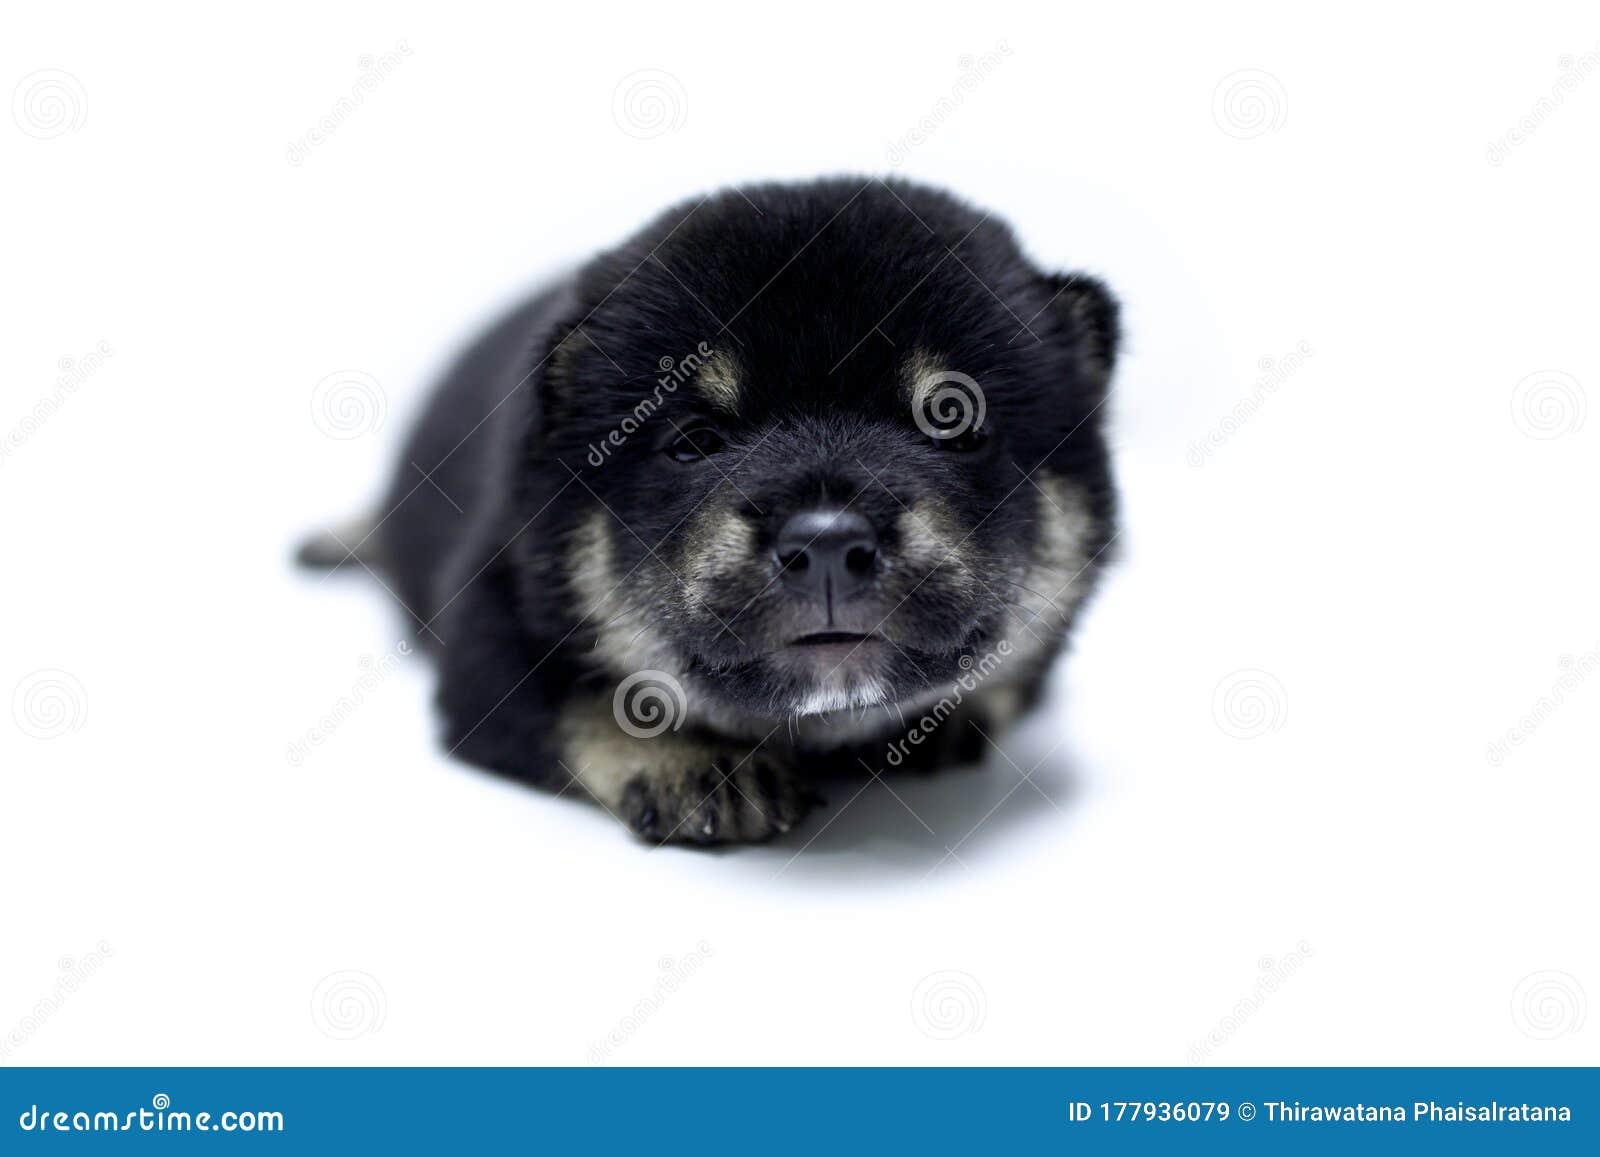 Close Up Of A Newborn Shiba Inu Puppy Japanese Dog Beautiful Shiba Inu Puppy Color Black 20 Day Old Puppy On White Background Stock Image Image Of Pedigree Black 177936079